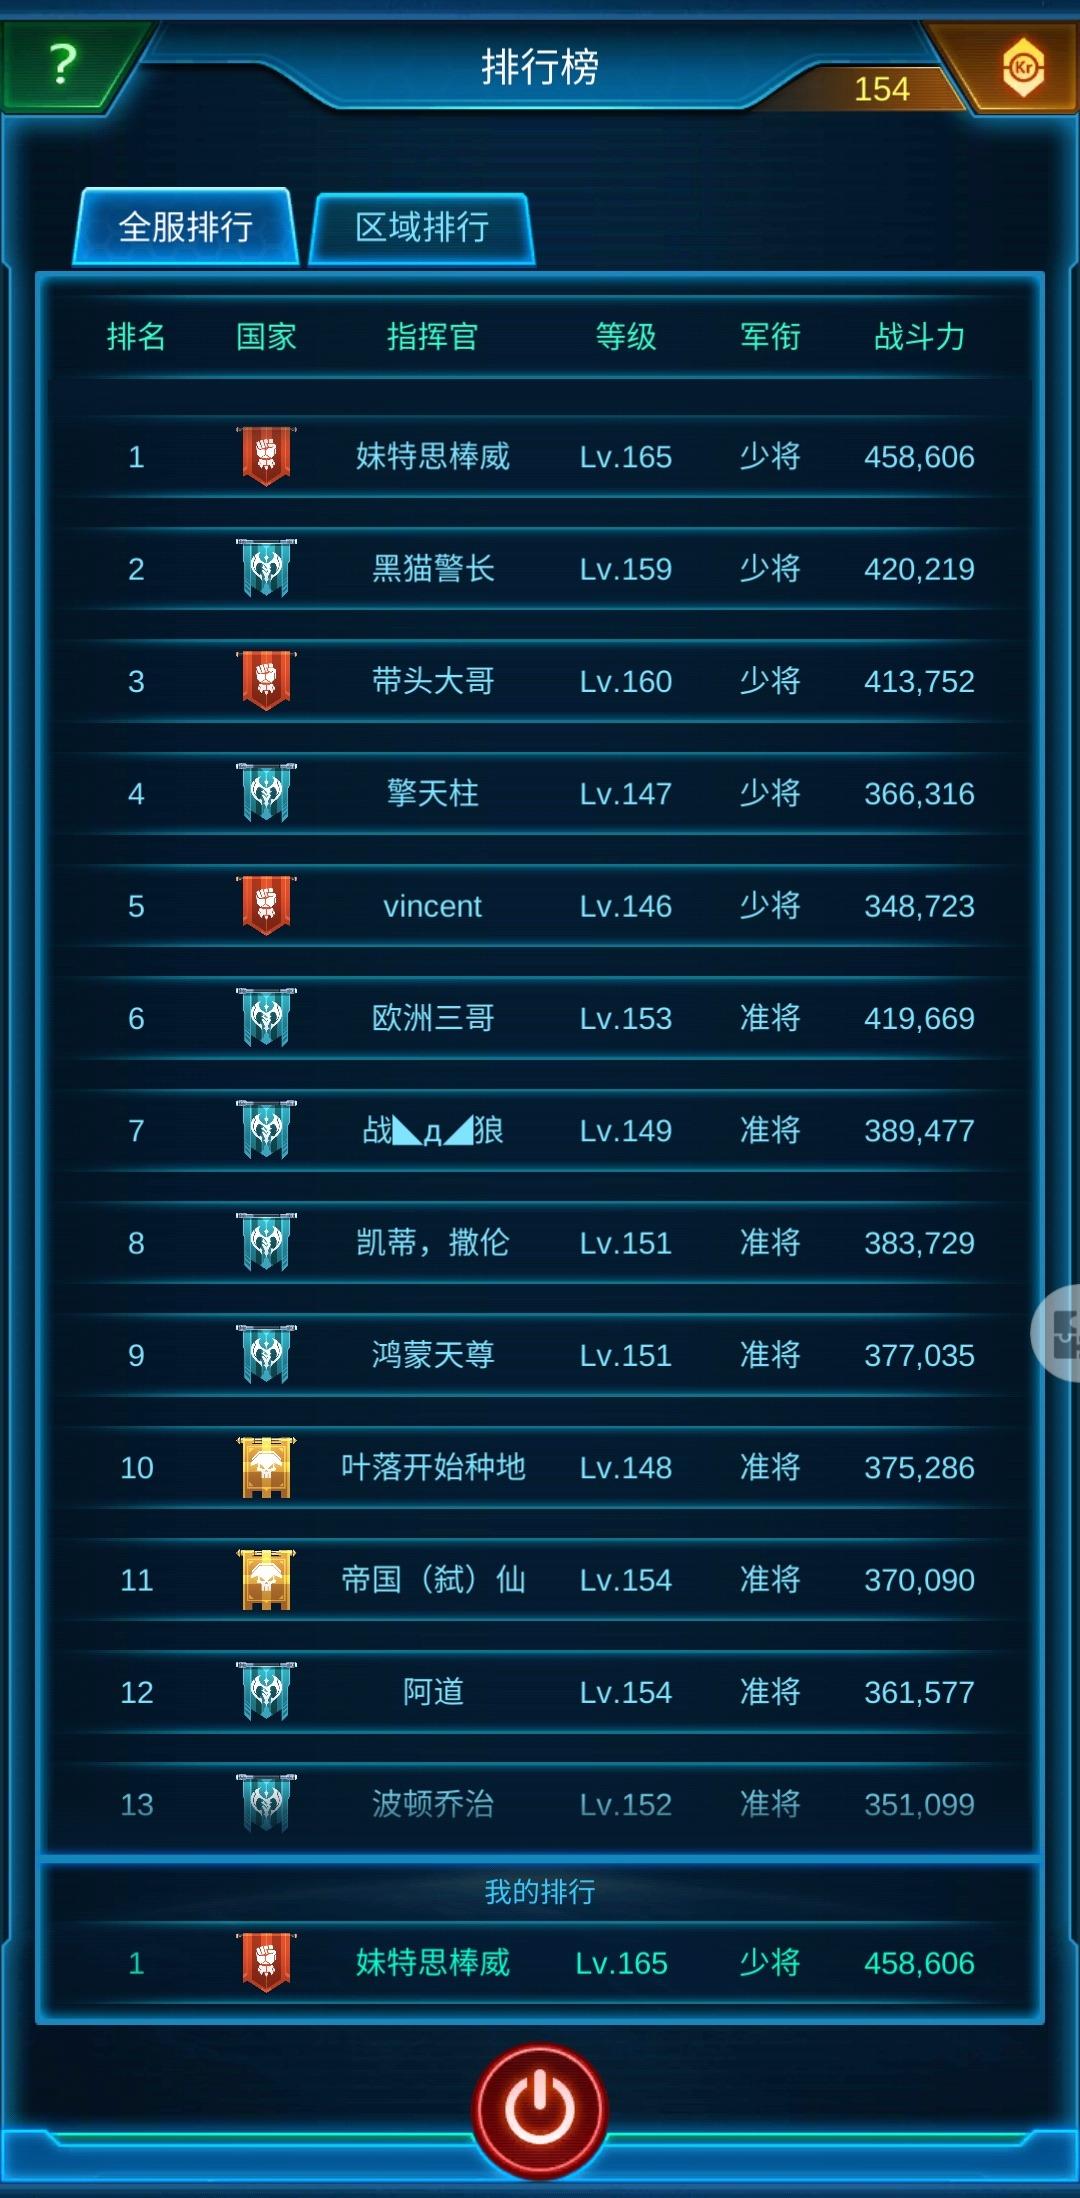 Screenshot_2020-02-08-23-20-25-866_com.jedigames.p16s.huawei.jpg